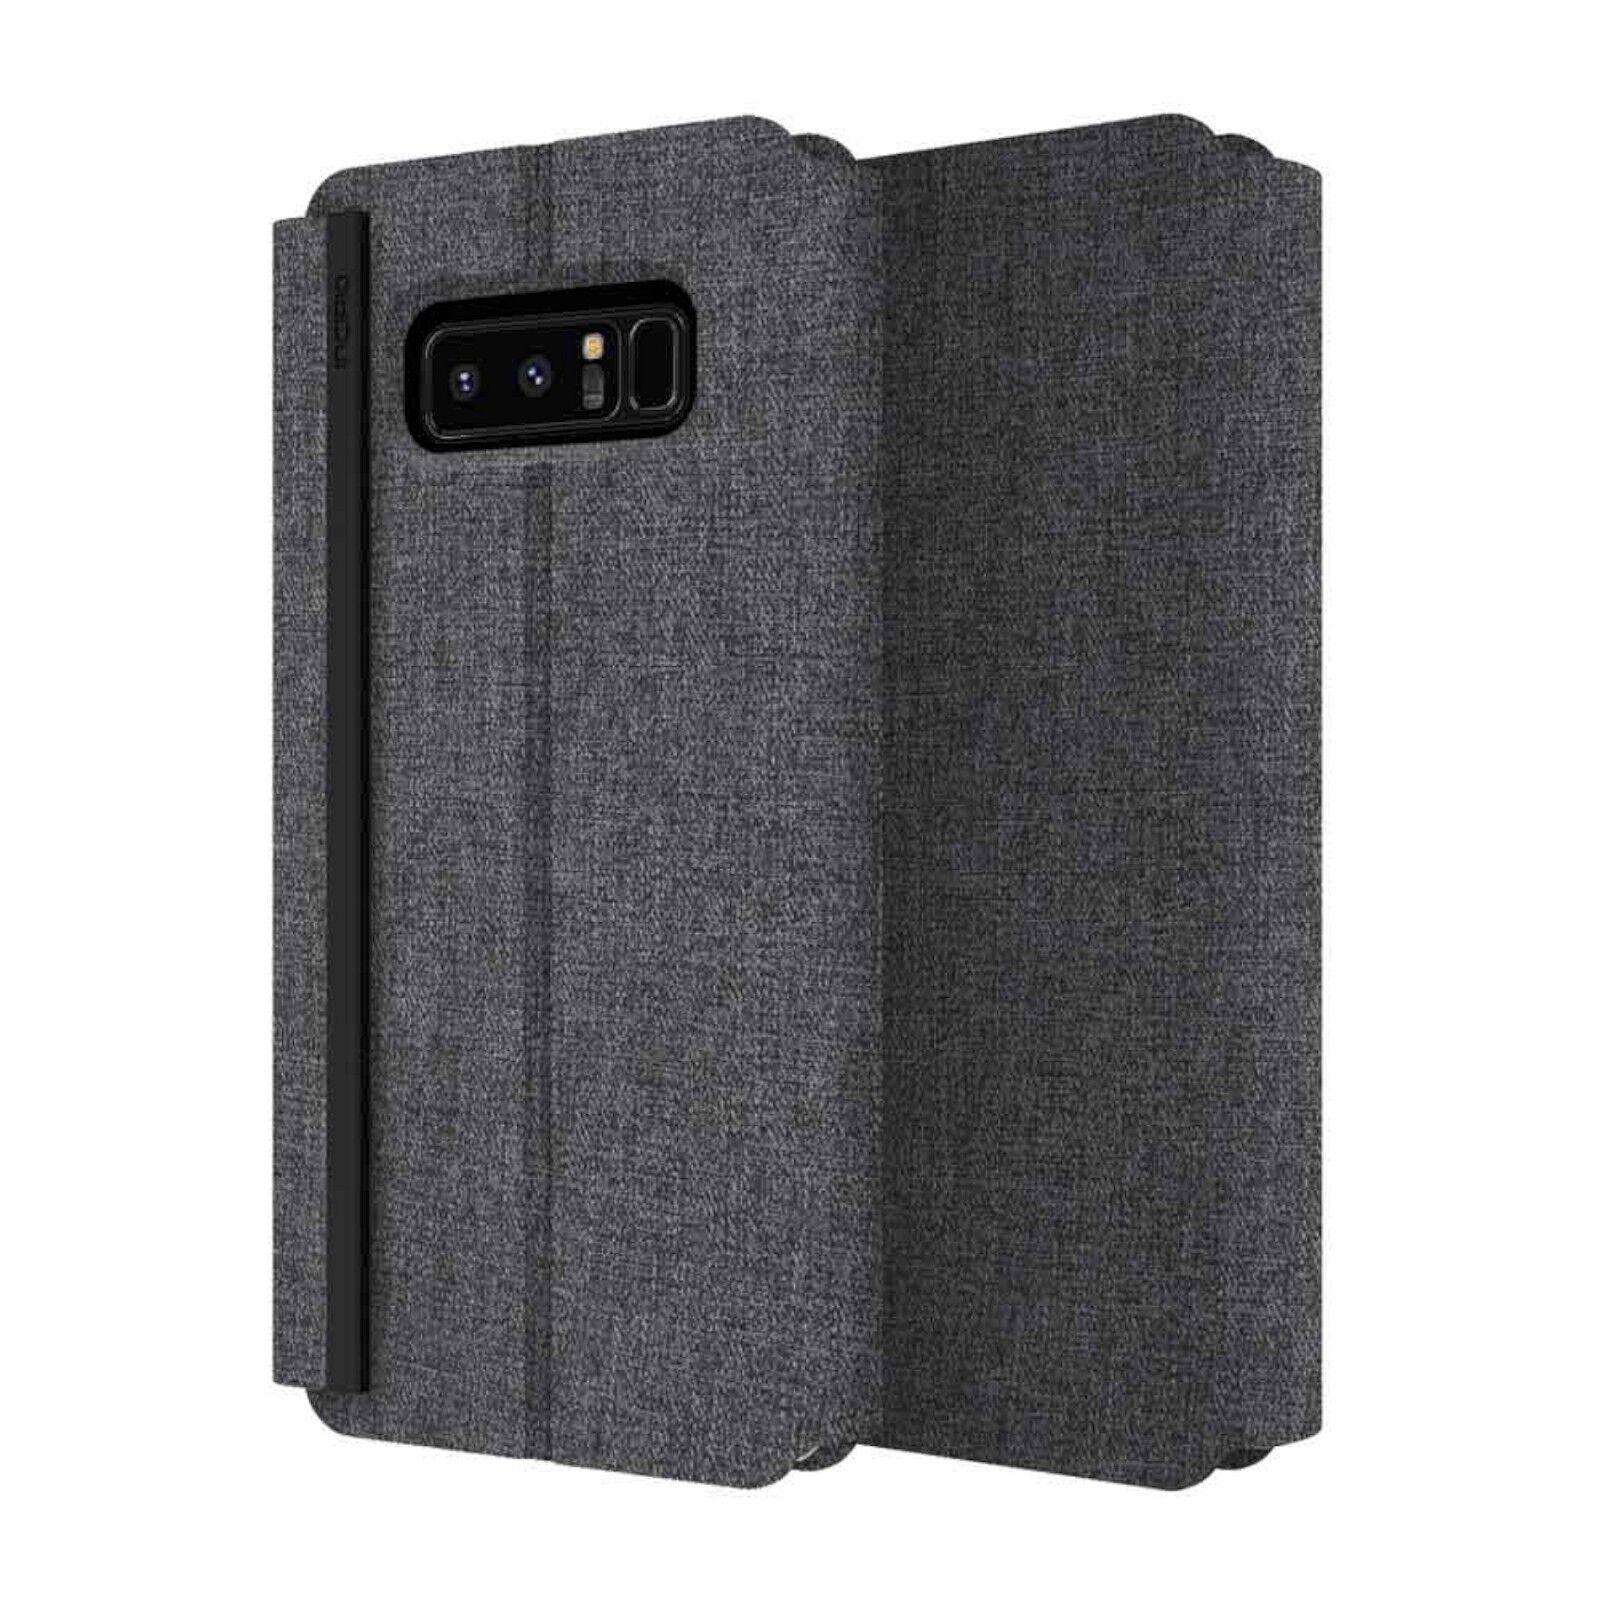 NEW Incipio Esquire Series Carnaby Folio Phone Case for Sams